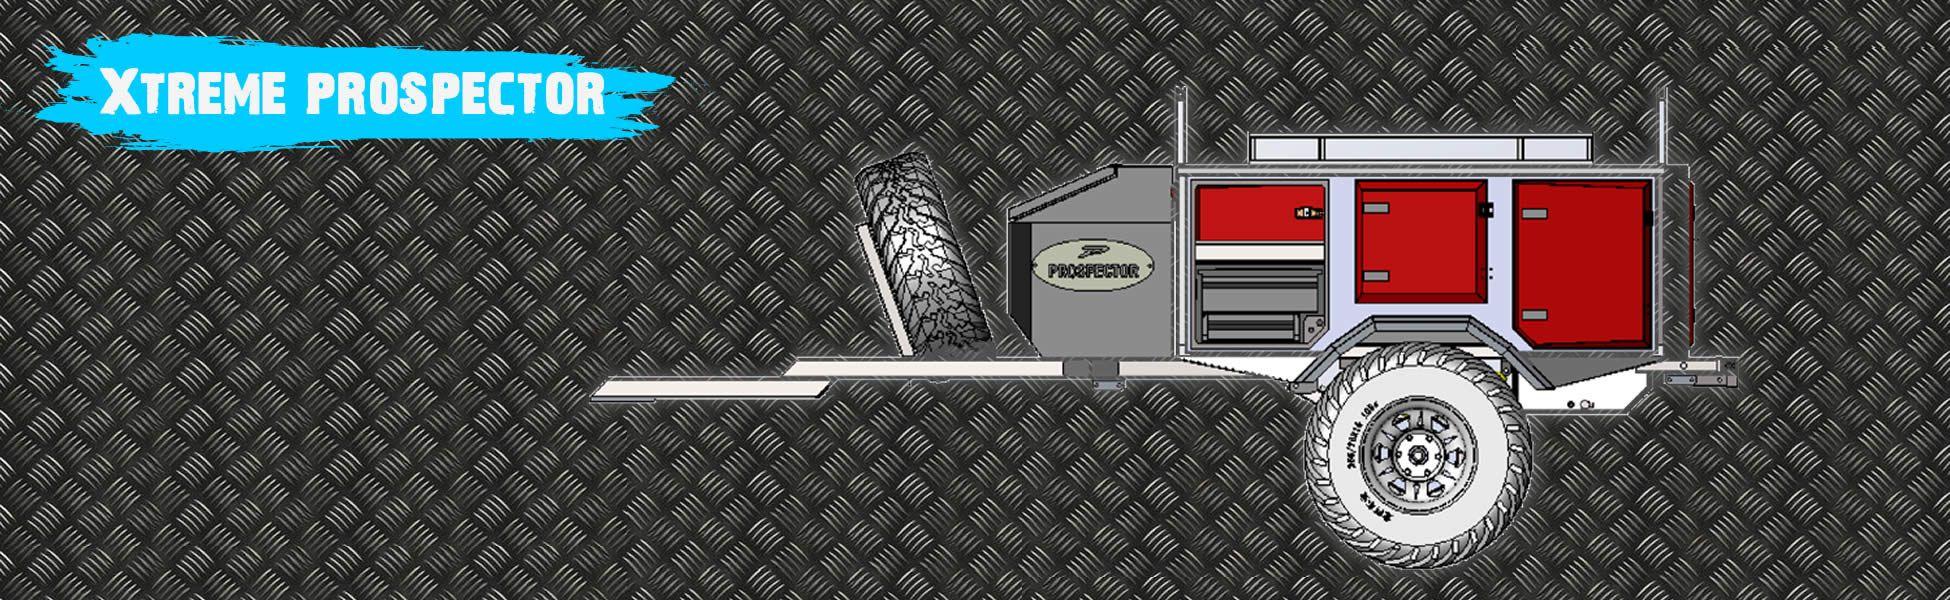 Xtreme Prospector off road Caravans Camper Trailers Sales